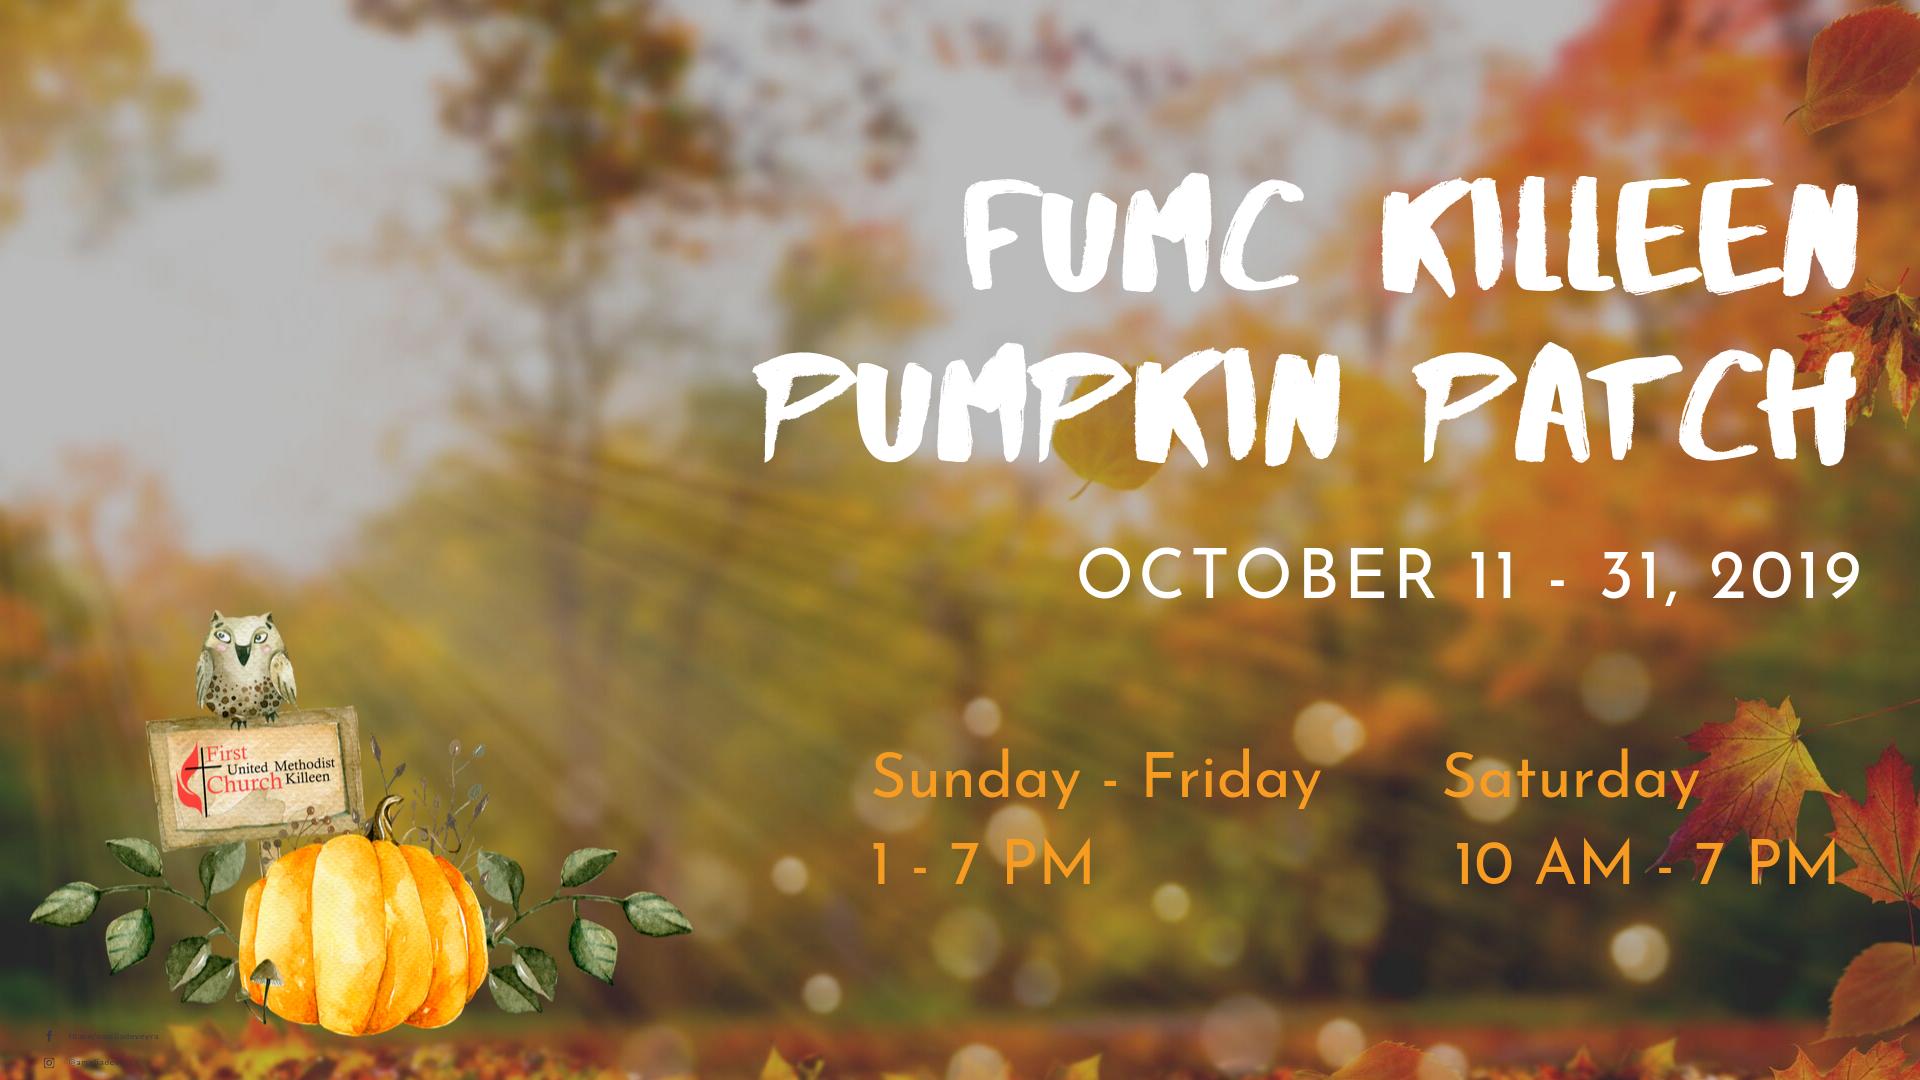 FUMC Killeen Pumpkin Patch